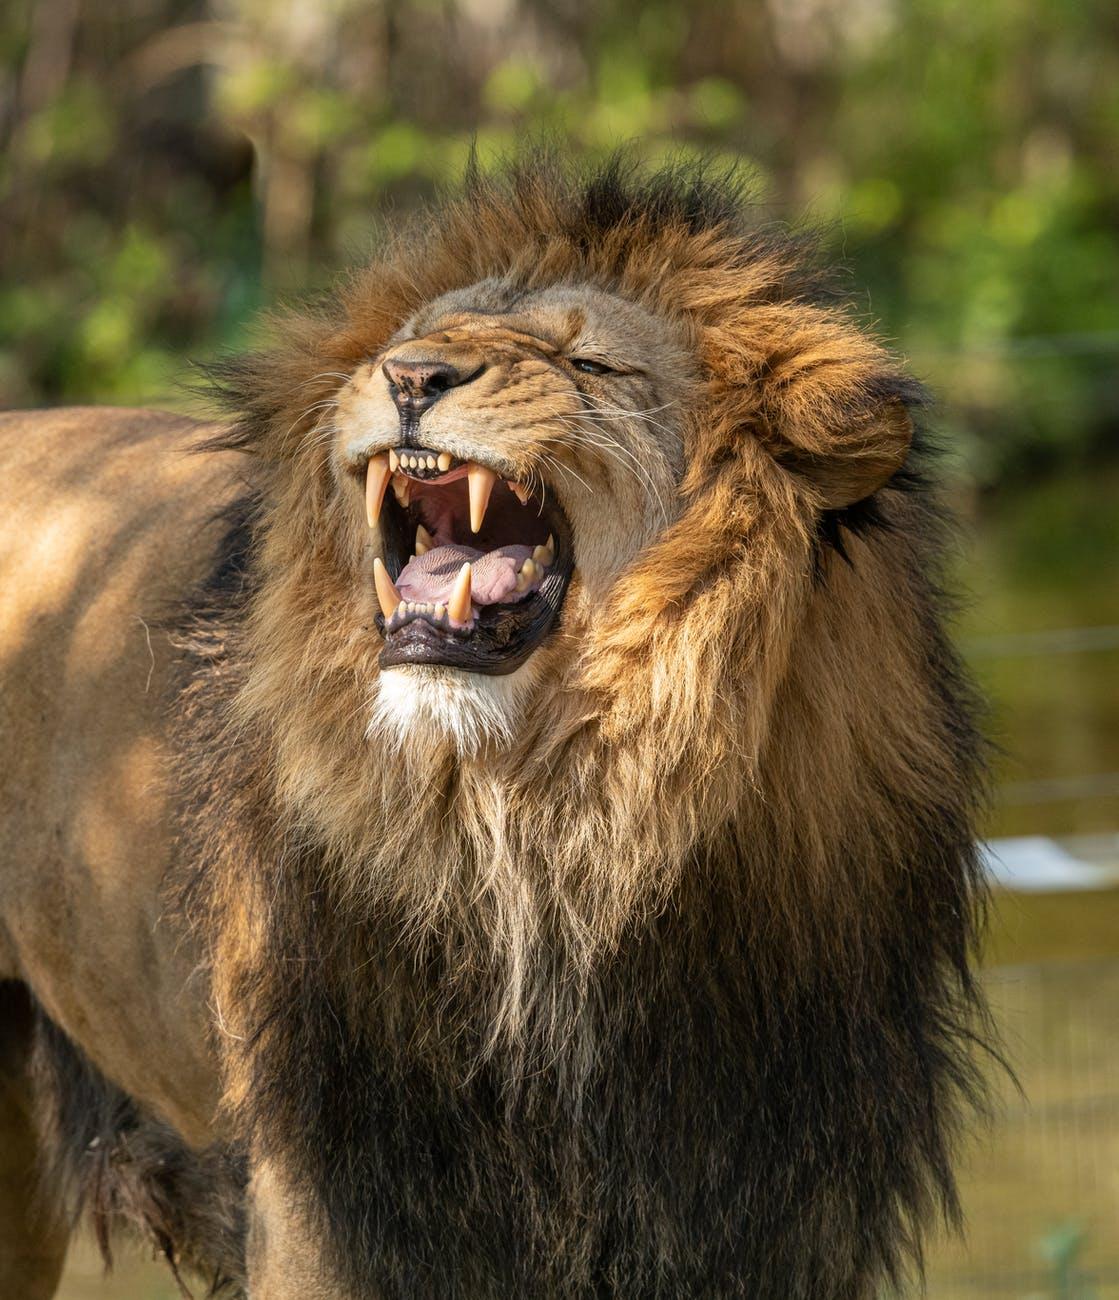 a roaring lion